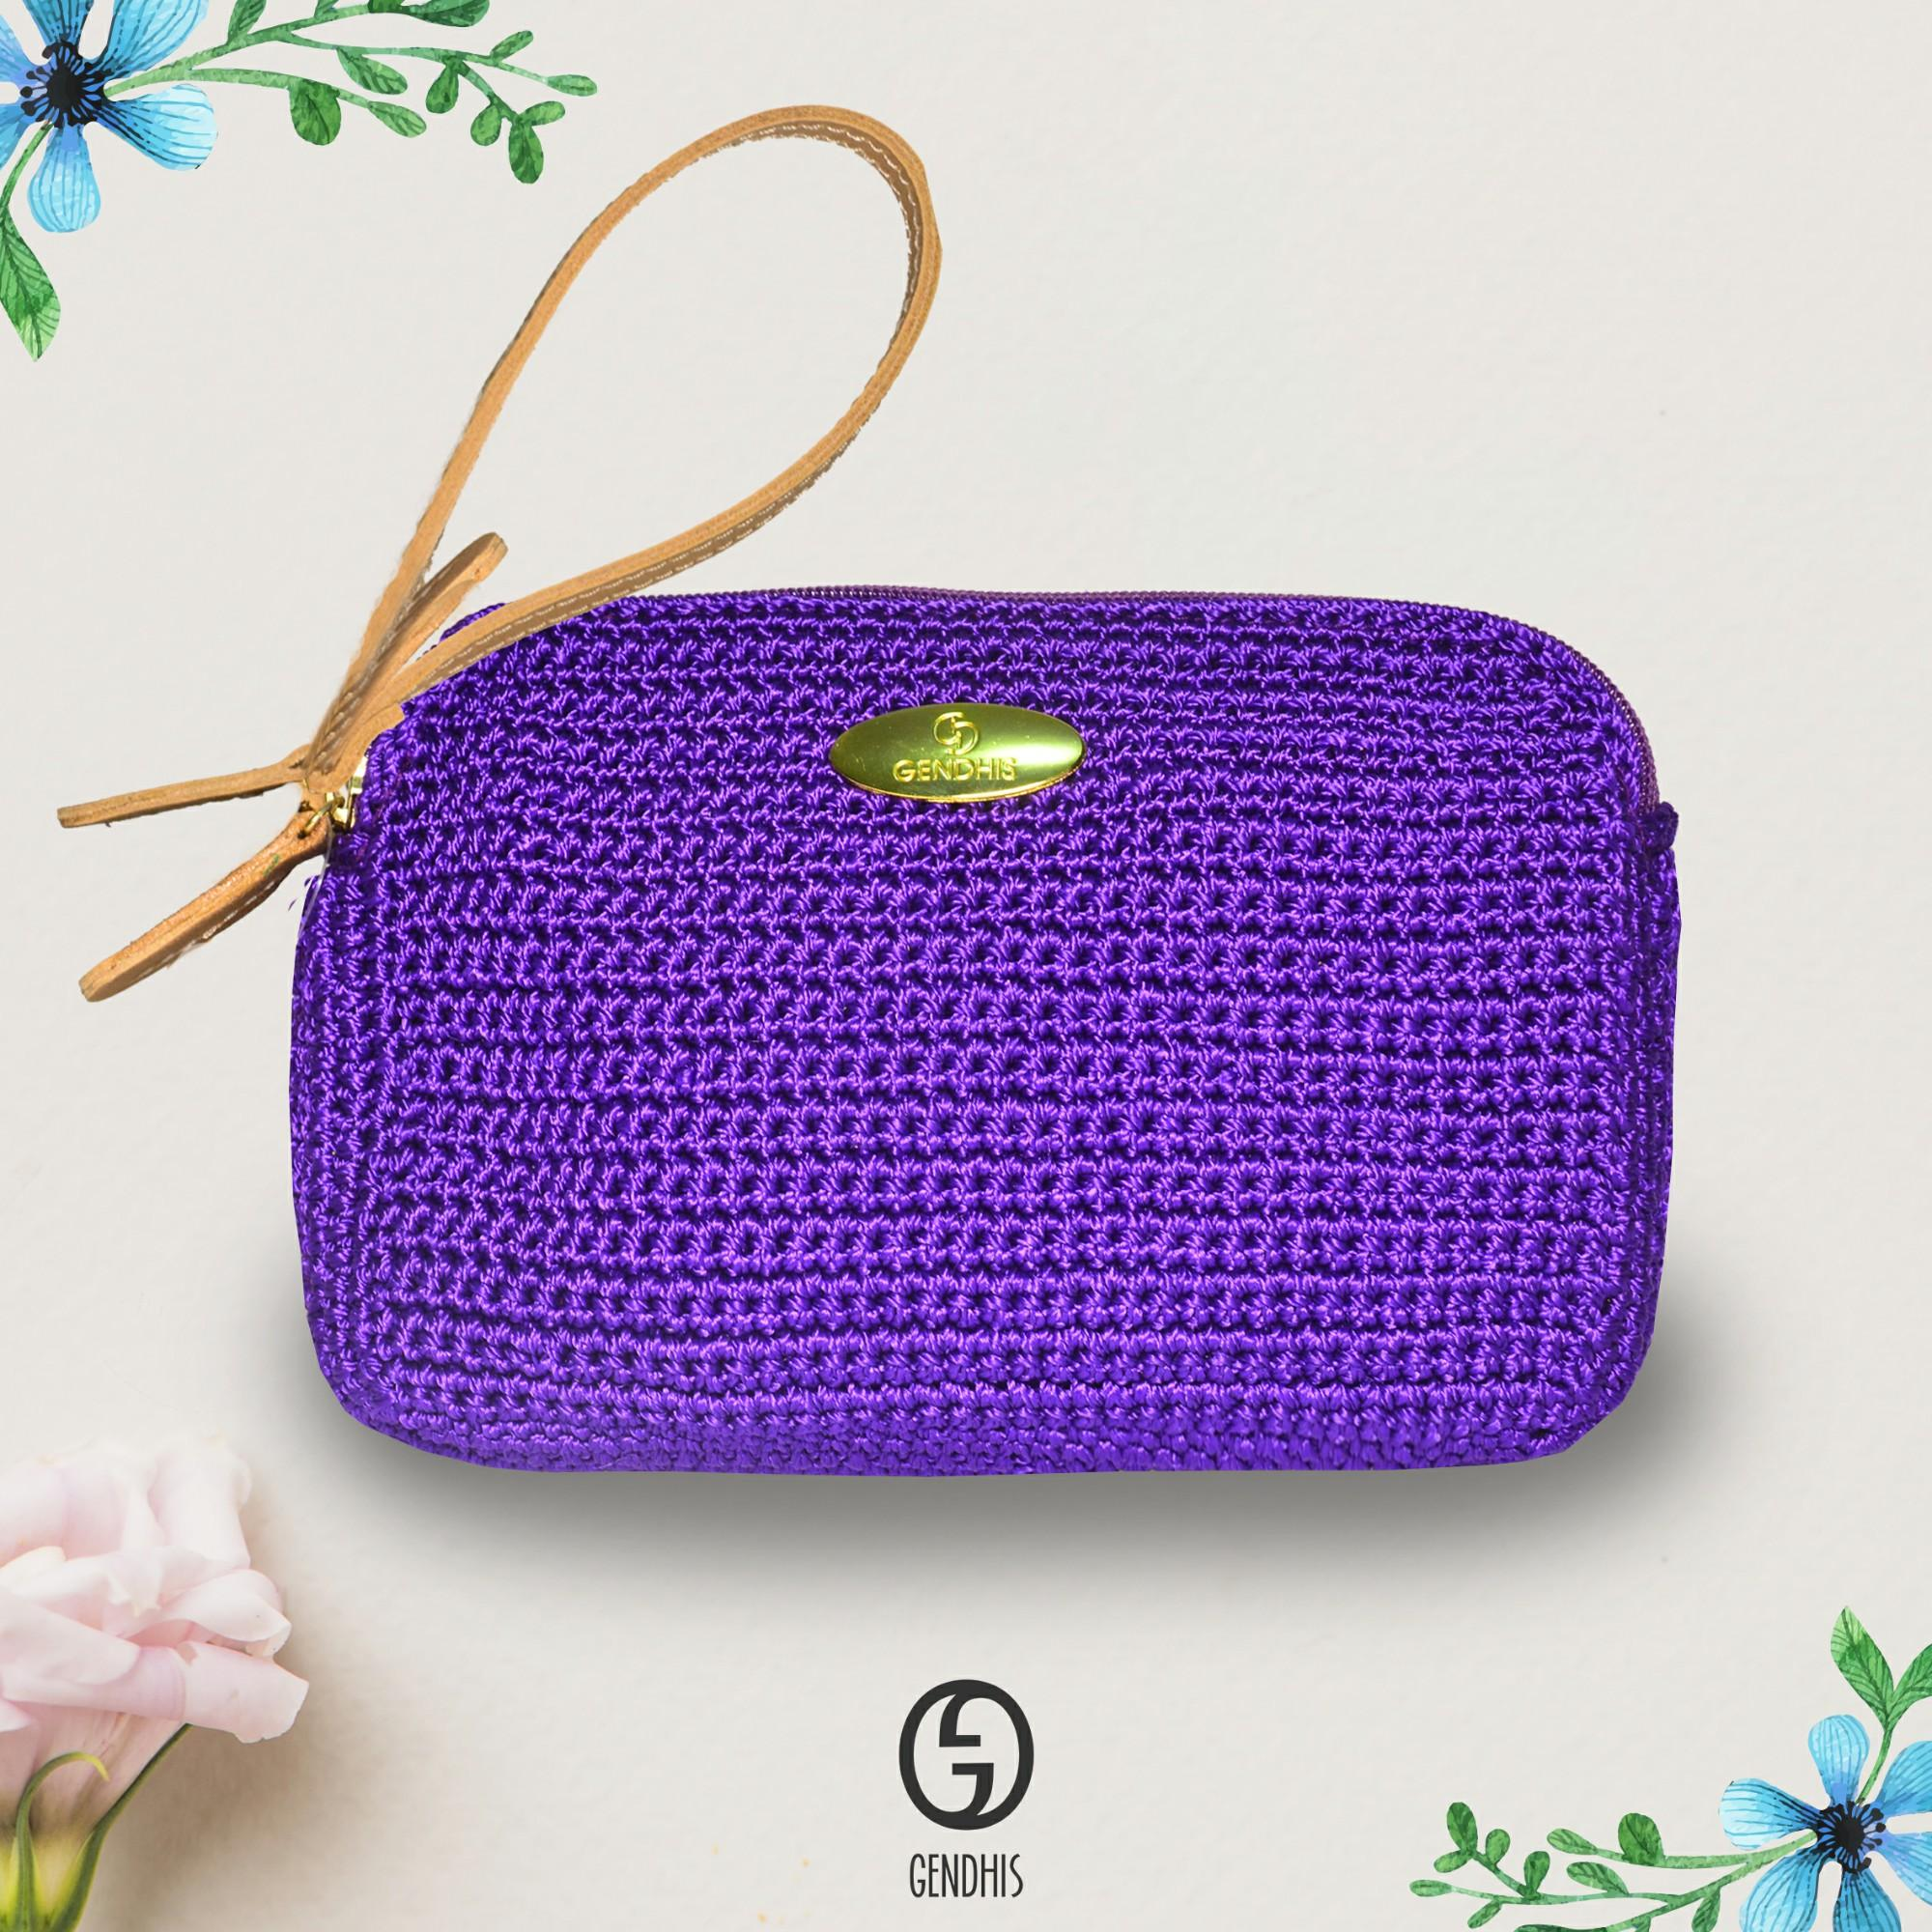 Tas Wanita / Tas Murah / Tas Kecil / Pouch Make Up / Pouch Bag / Pouch Wanita Sherly Violet pouch Original Gendhis Pouch Rajut